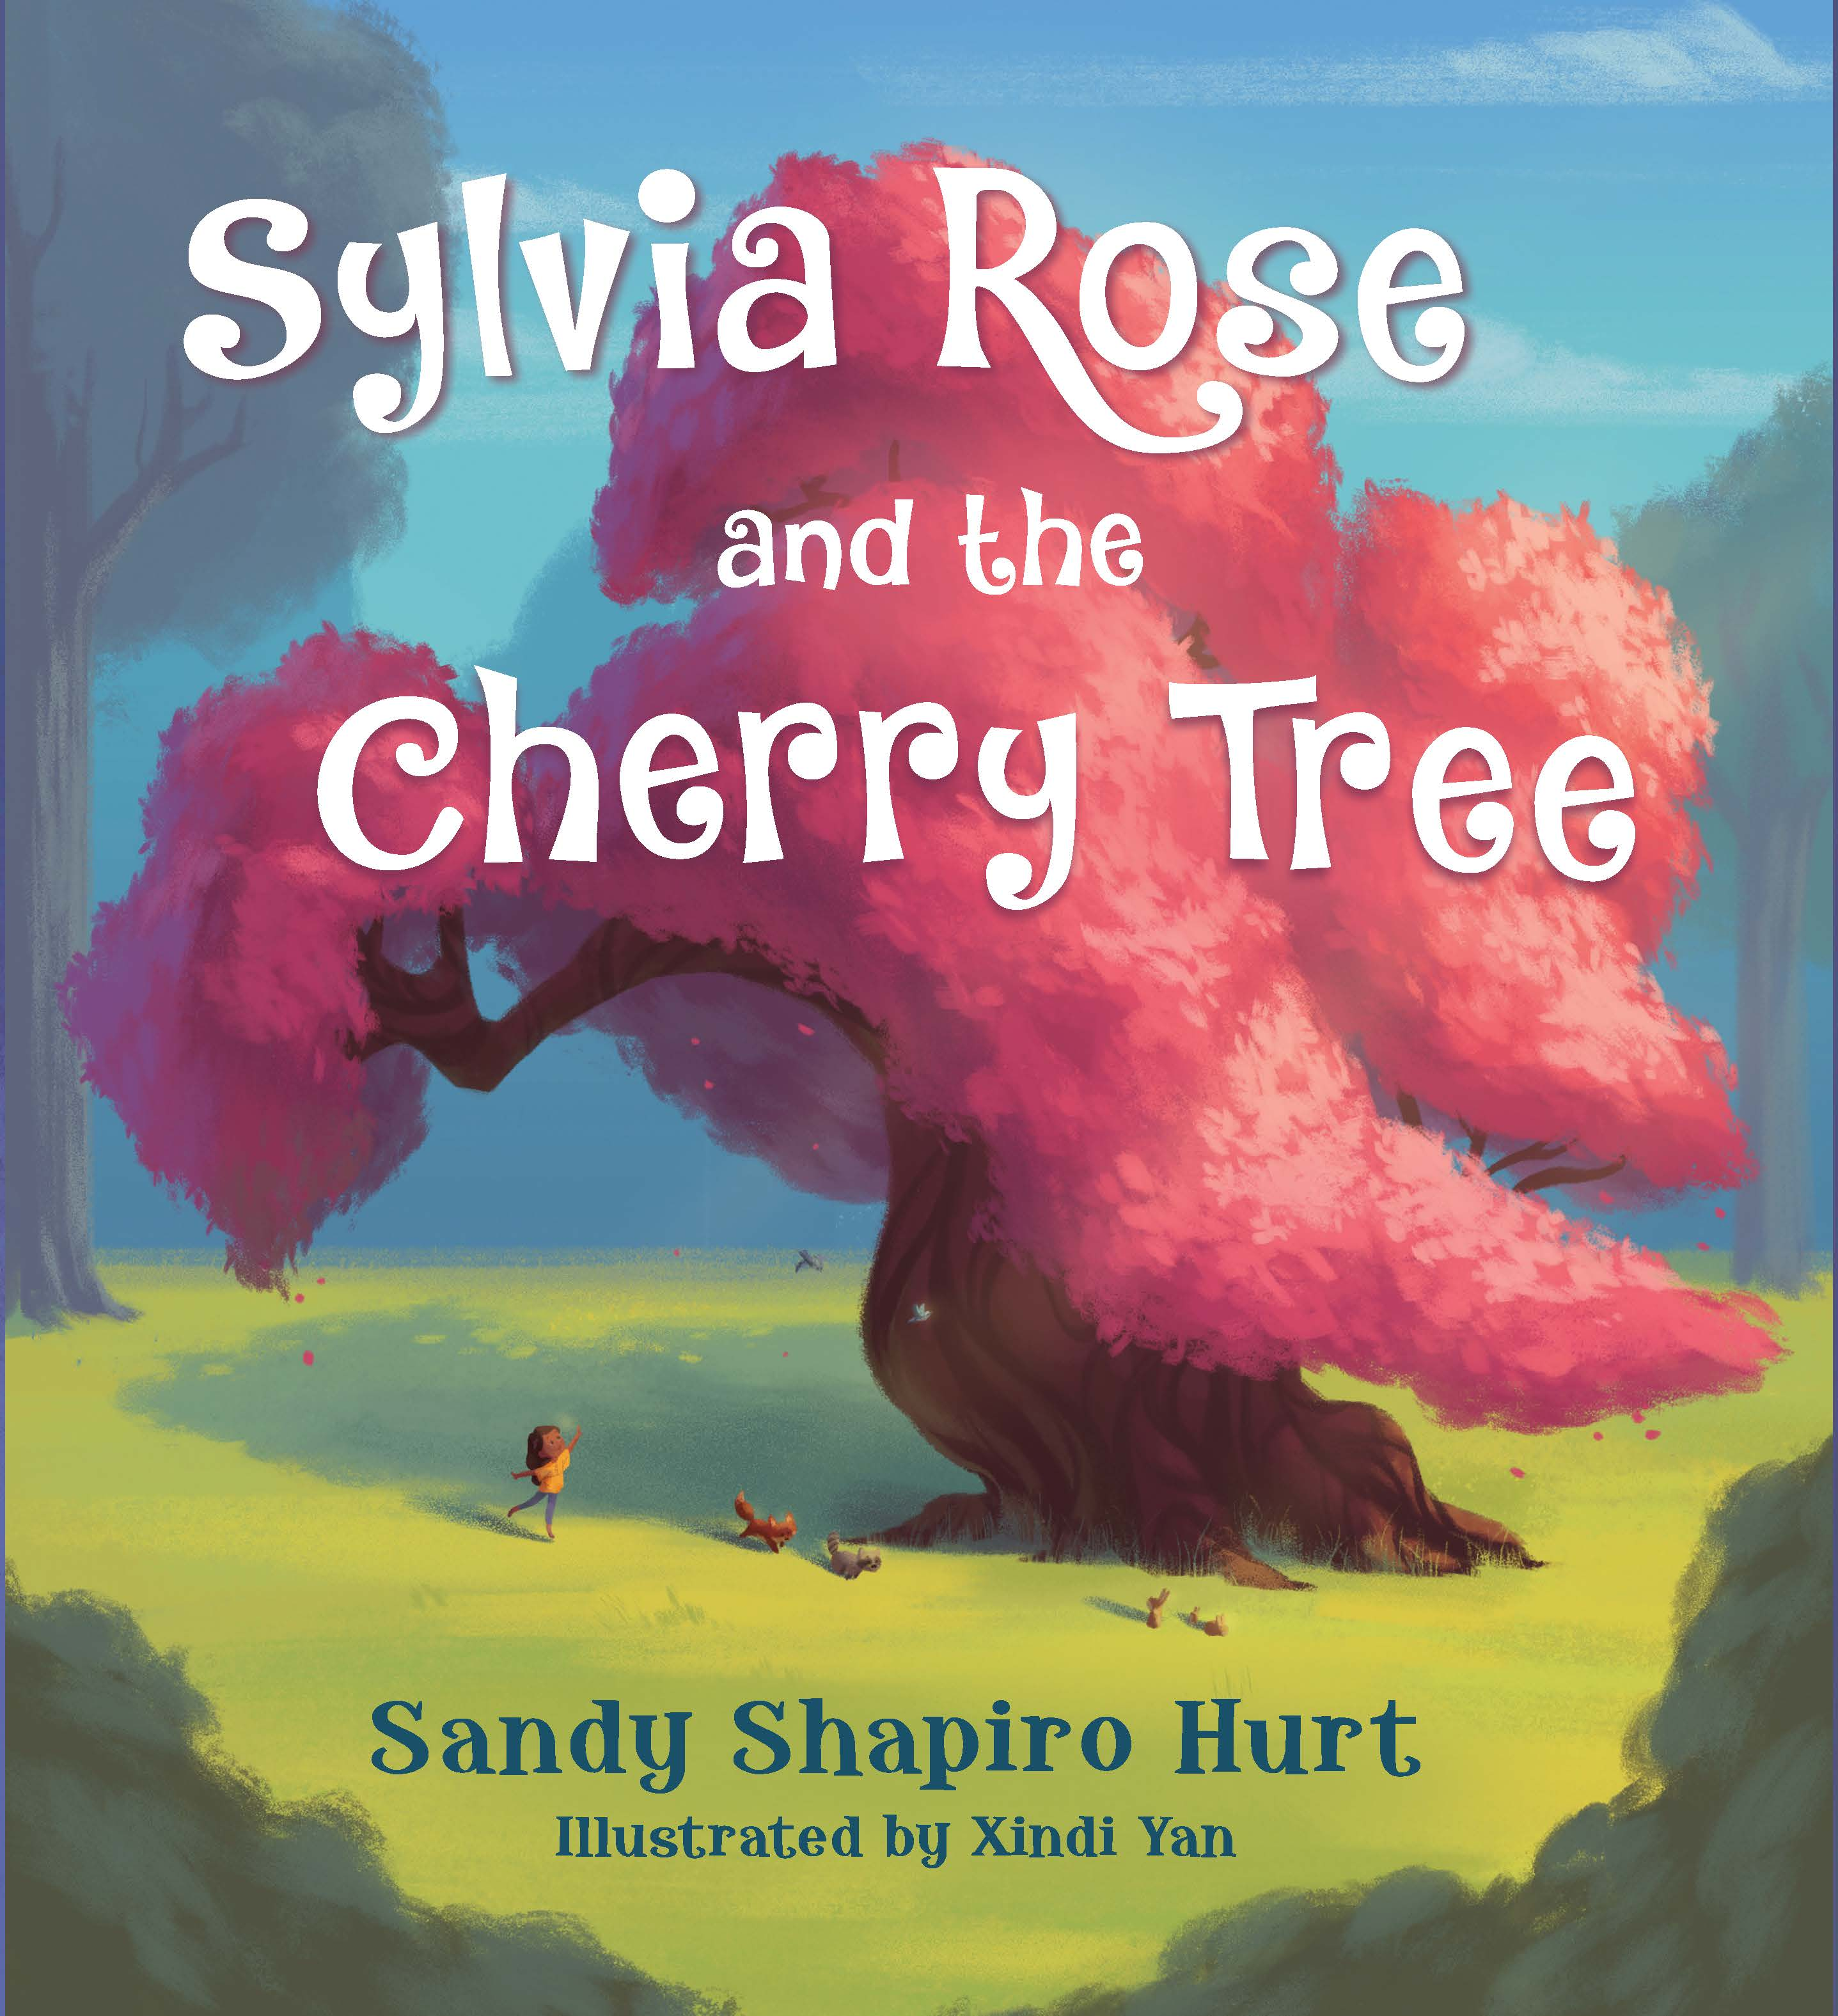 Sunday Story Time with Sandy Shapiro-Hurt & Xindi Yan (Author & Illustrator of Sylvia Rose and the Cherry Tree)